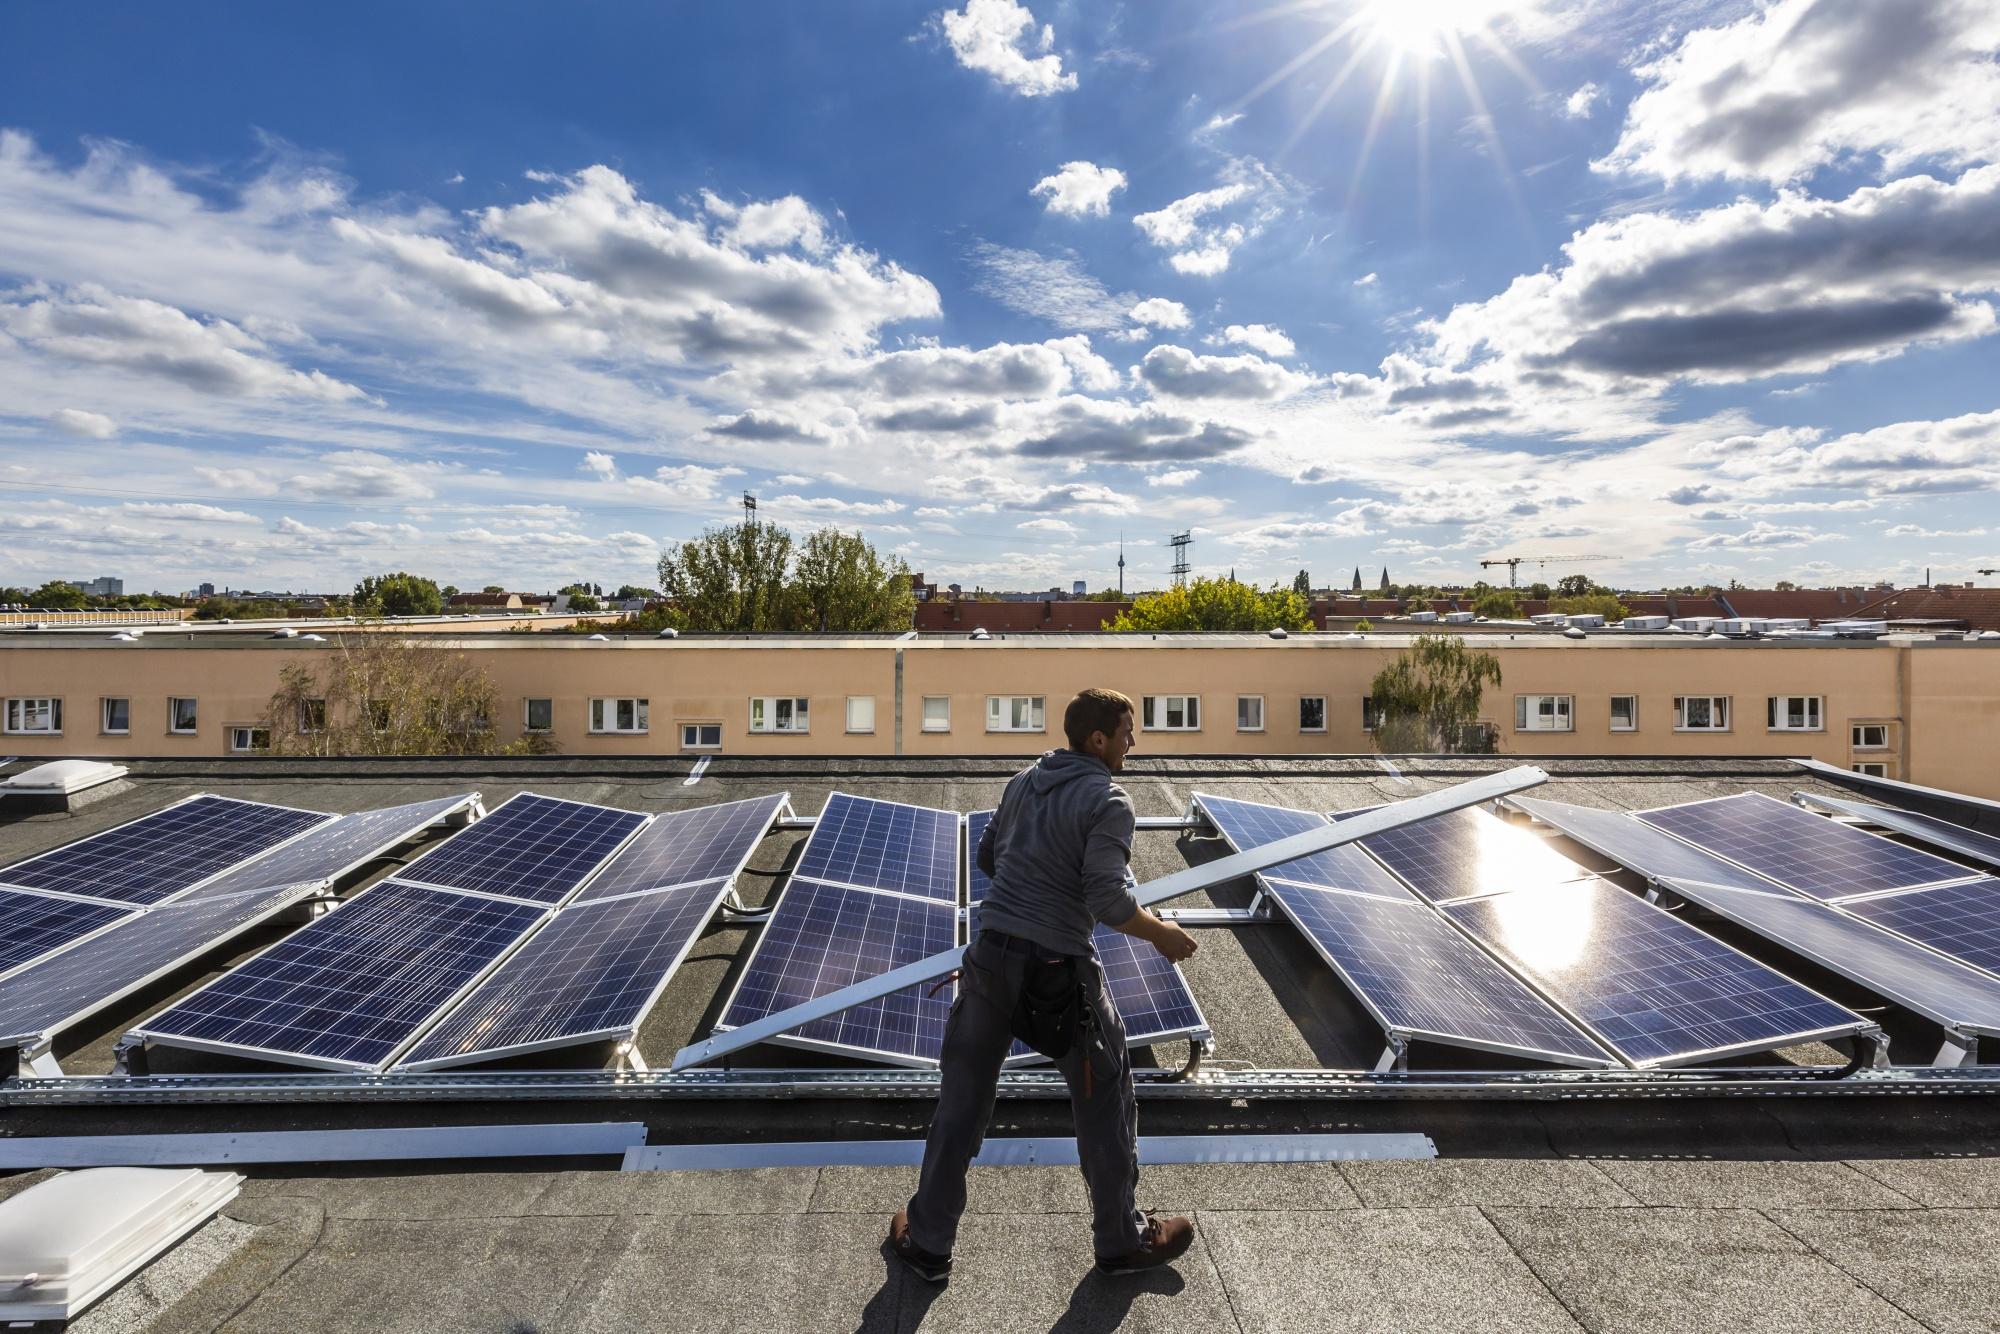 Residential Solar Power Installation In Germany